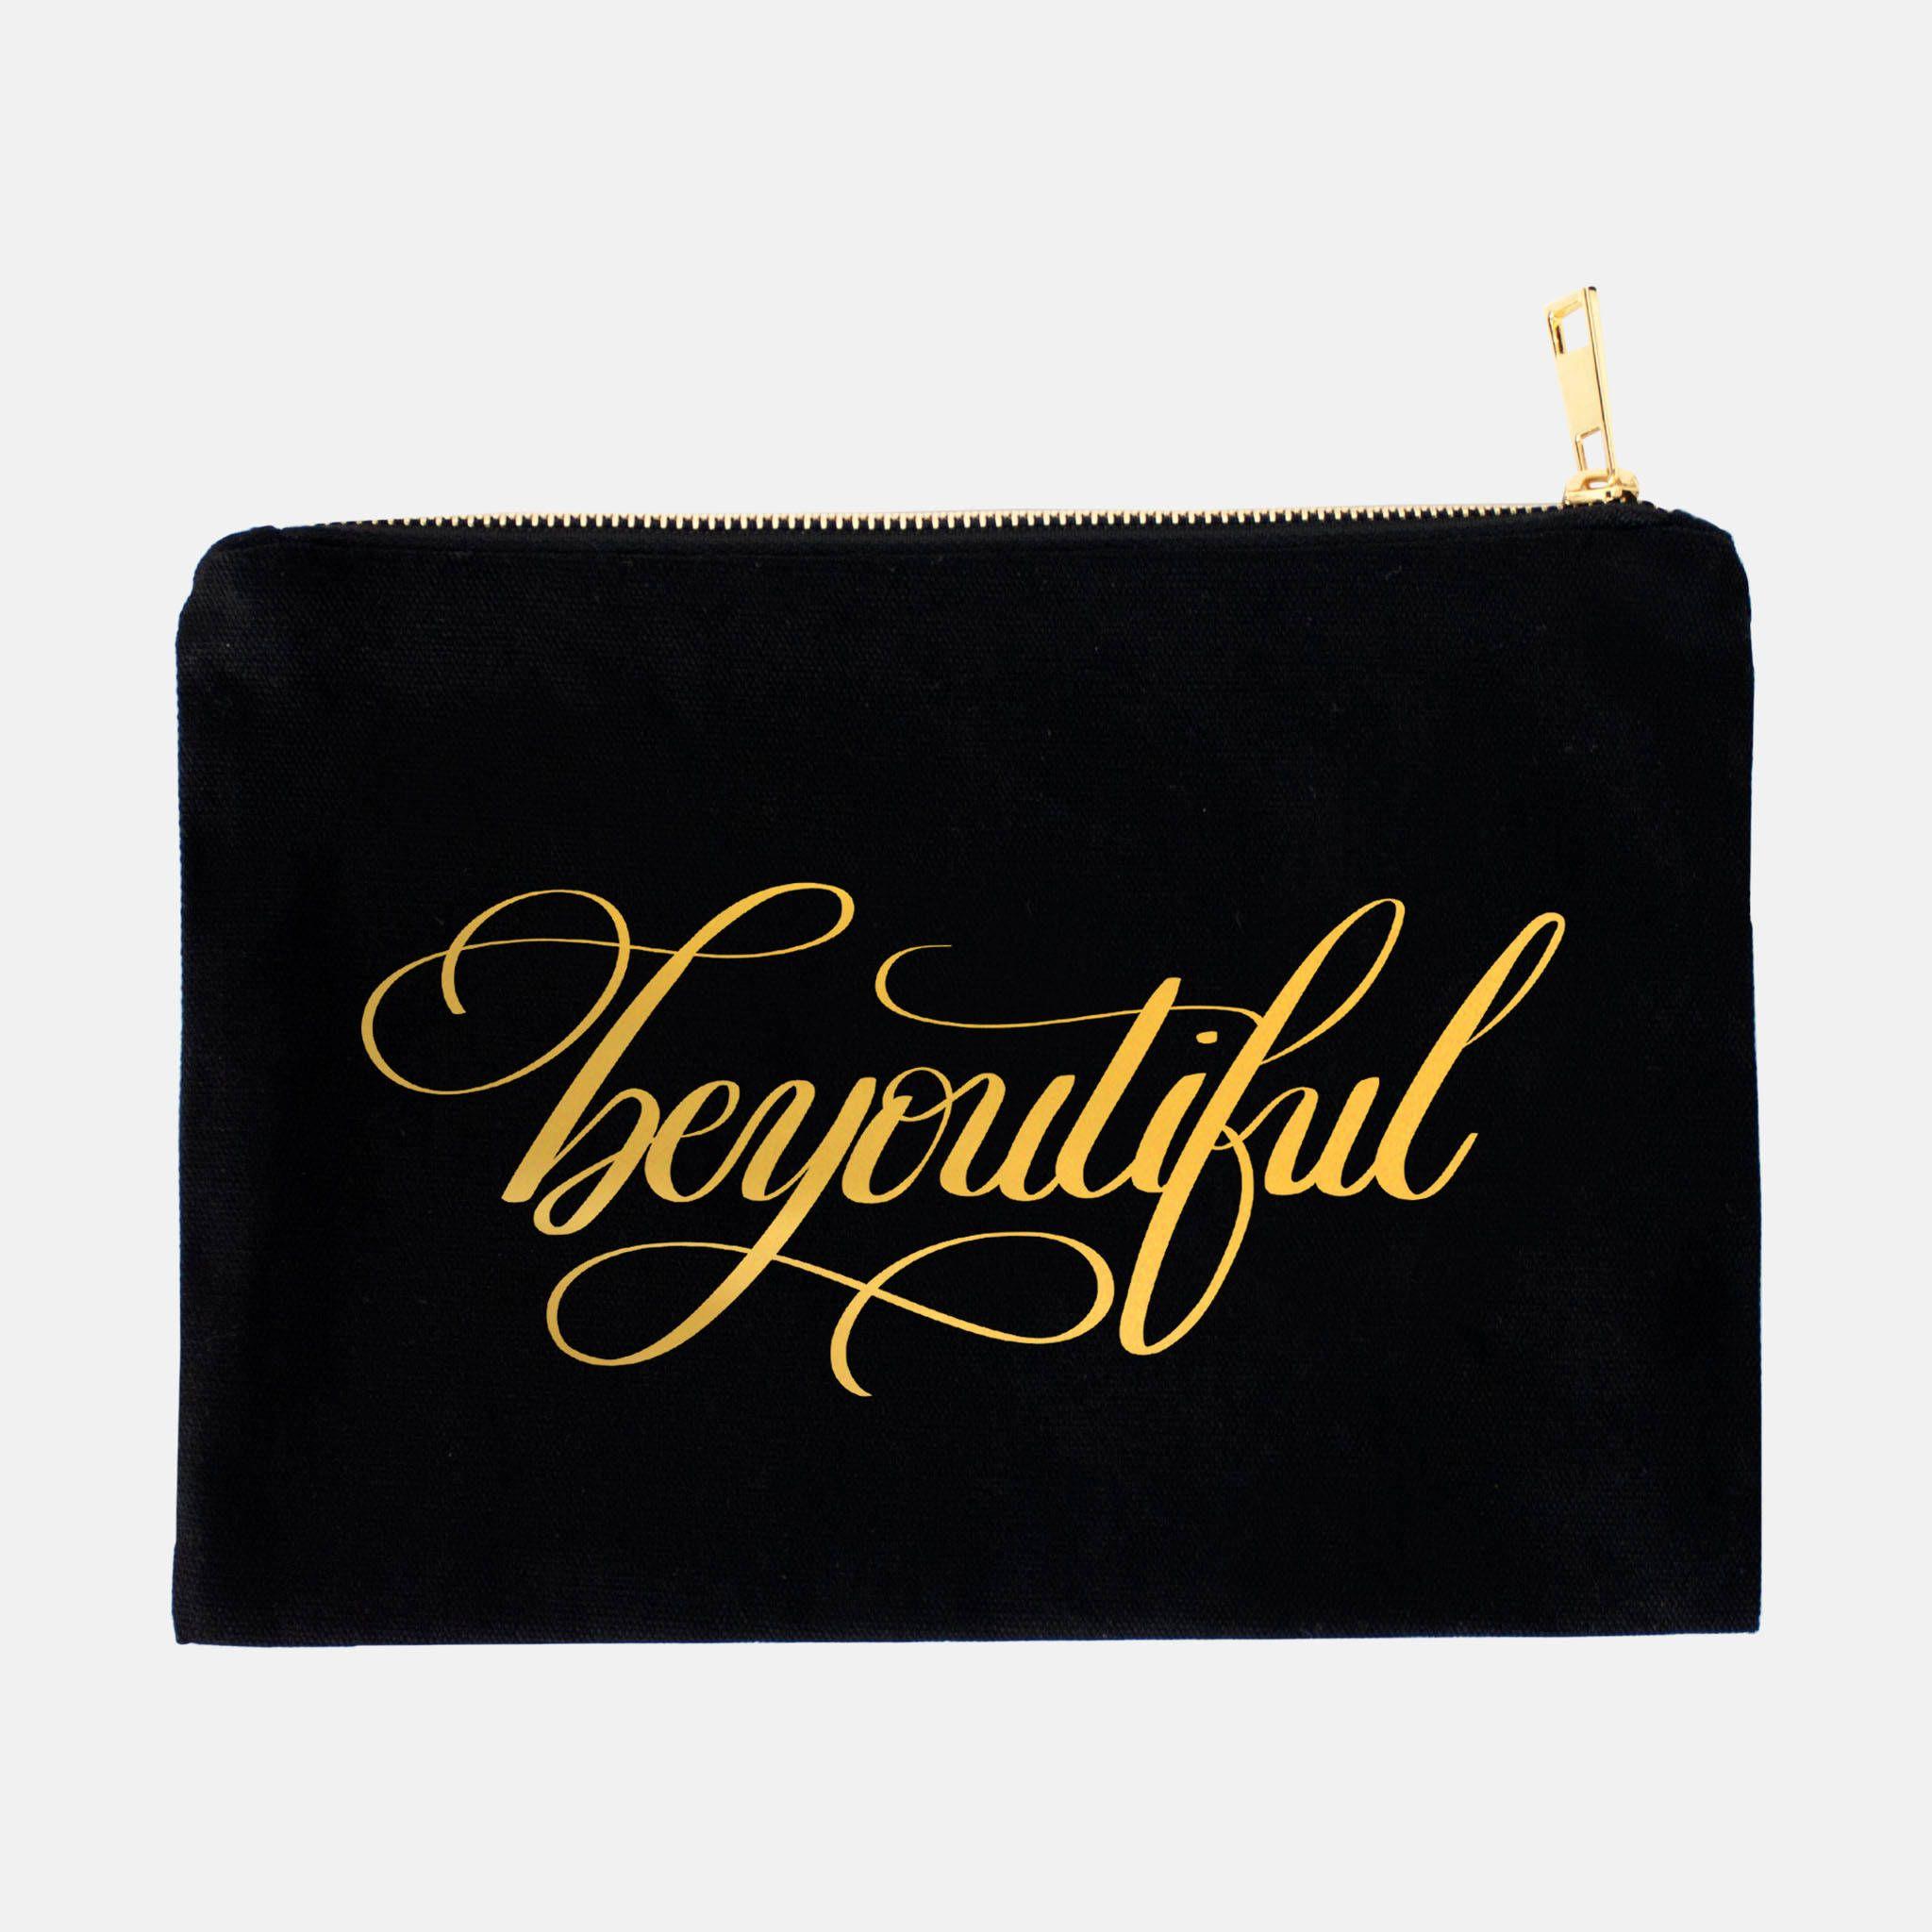 Be You Tiful Canvas Makeup Bag, Bag with Sayings, Gold